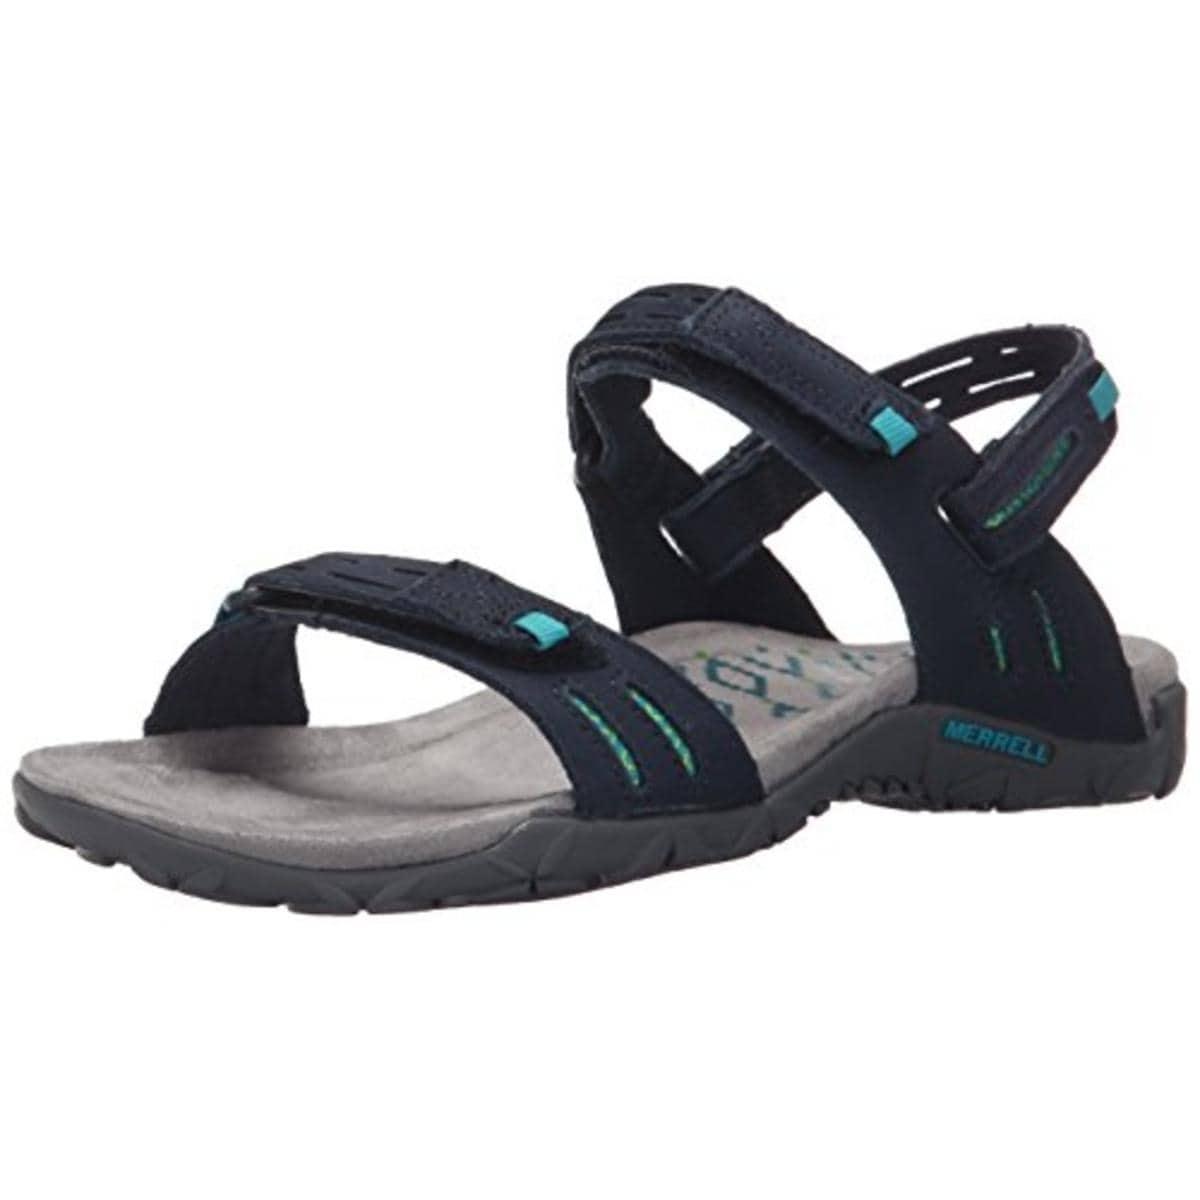 5020b4830077 Shop Merrell Womens Terran Strap II Sport Sandals Leather Casual - 9 medium  (b